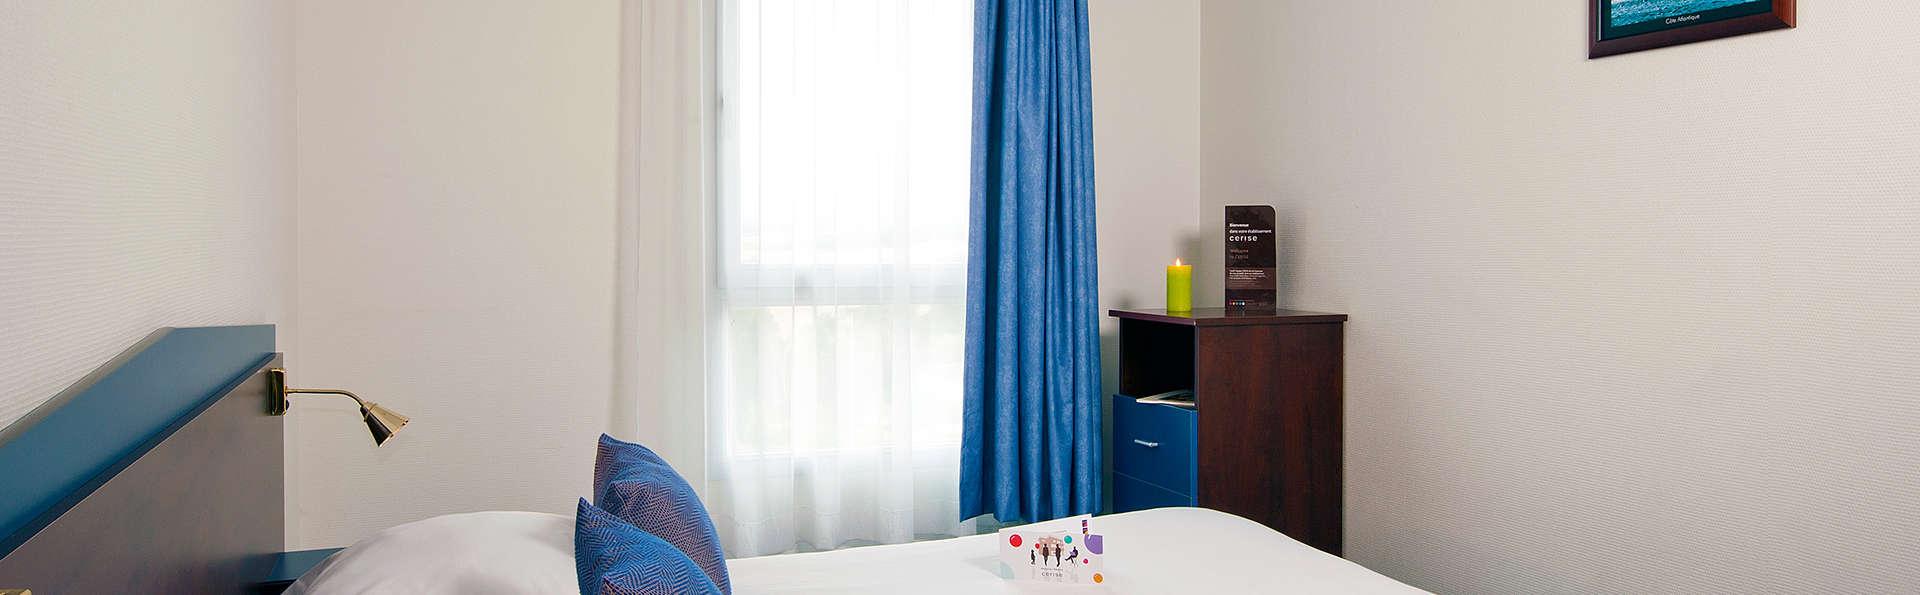 Cerise Carcassonne Nord - EDIT_room4.jpg